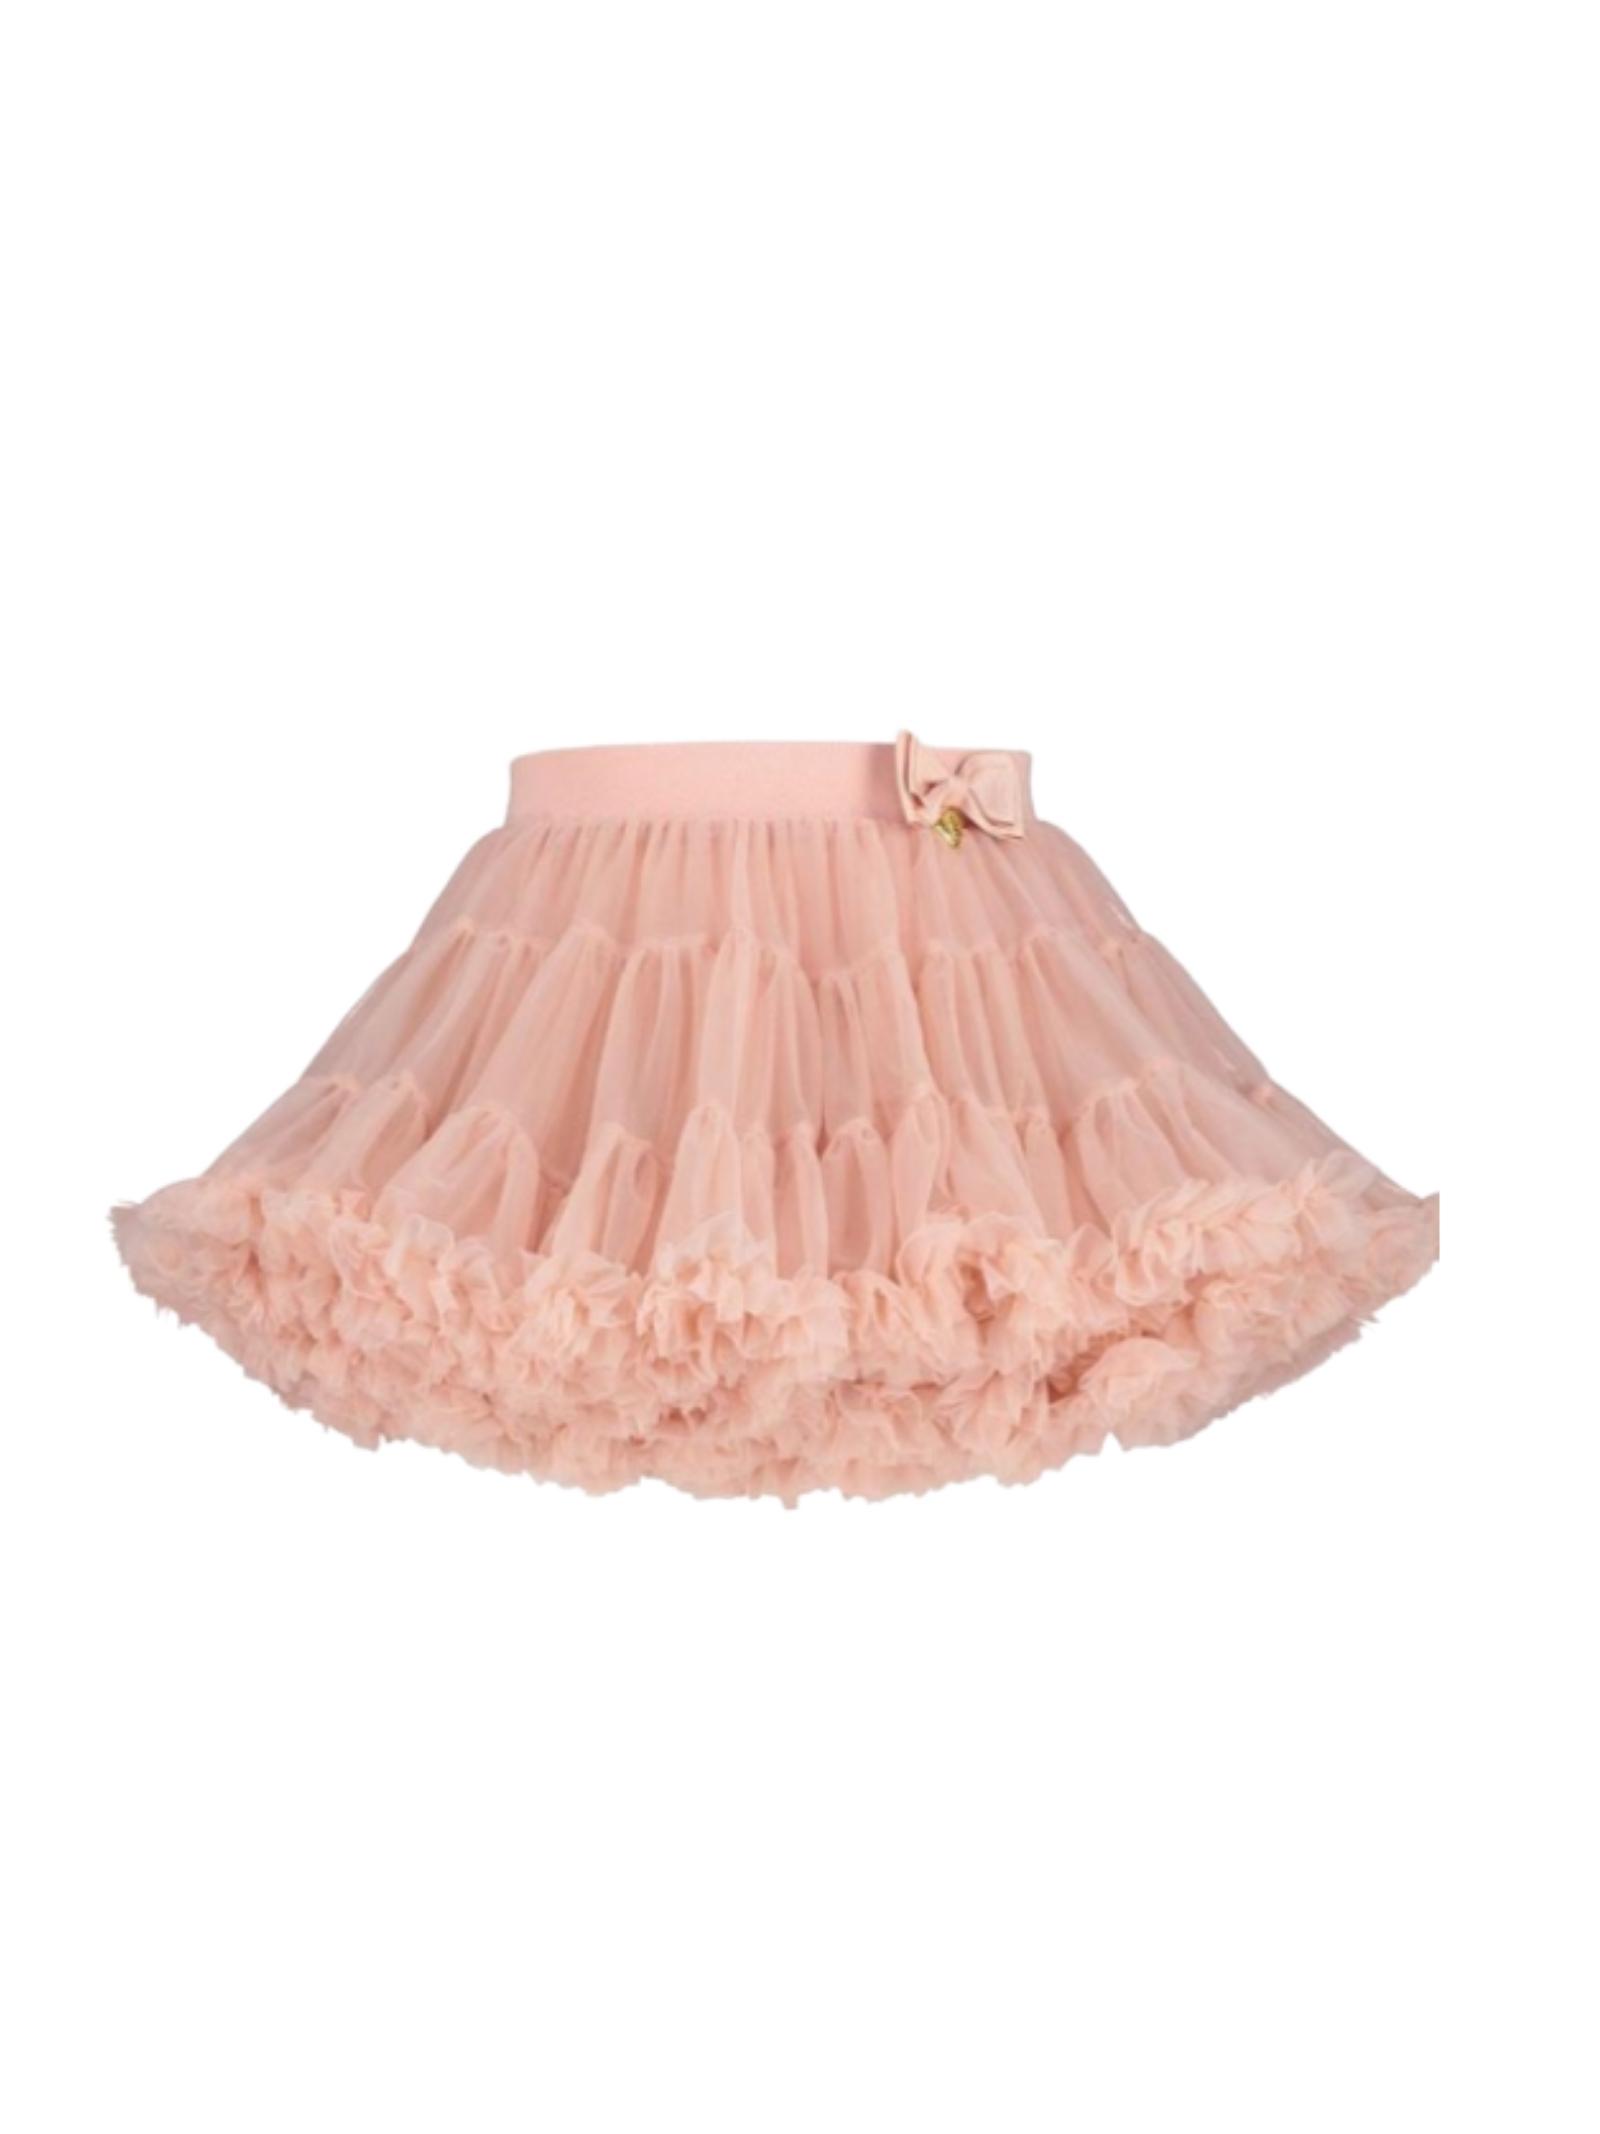 Little Girls Tutu Pixie Blush Skirt ANGEL'S FACE | Skirts | PIXIEBLUSH